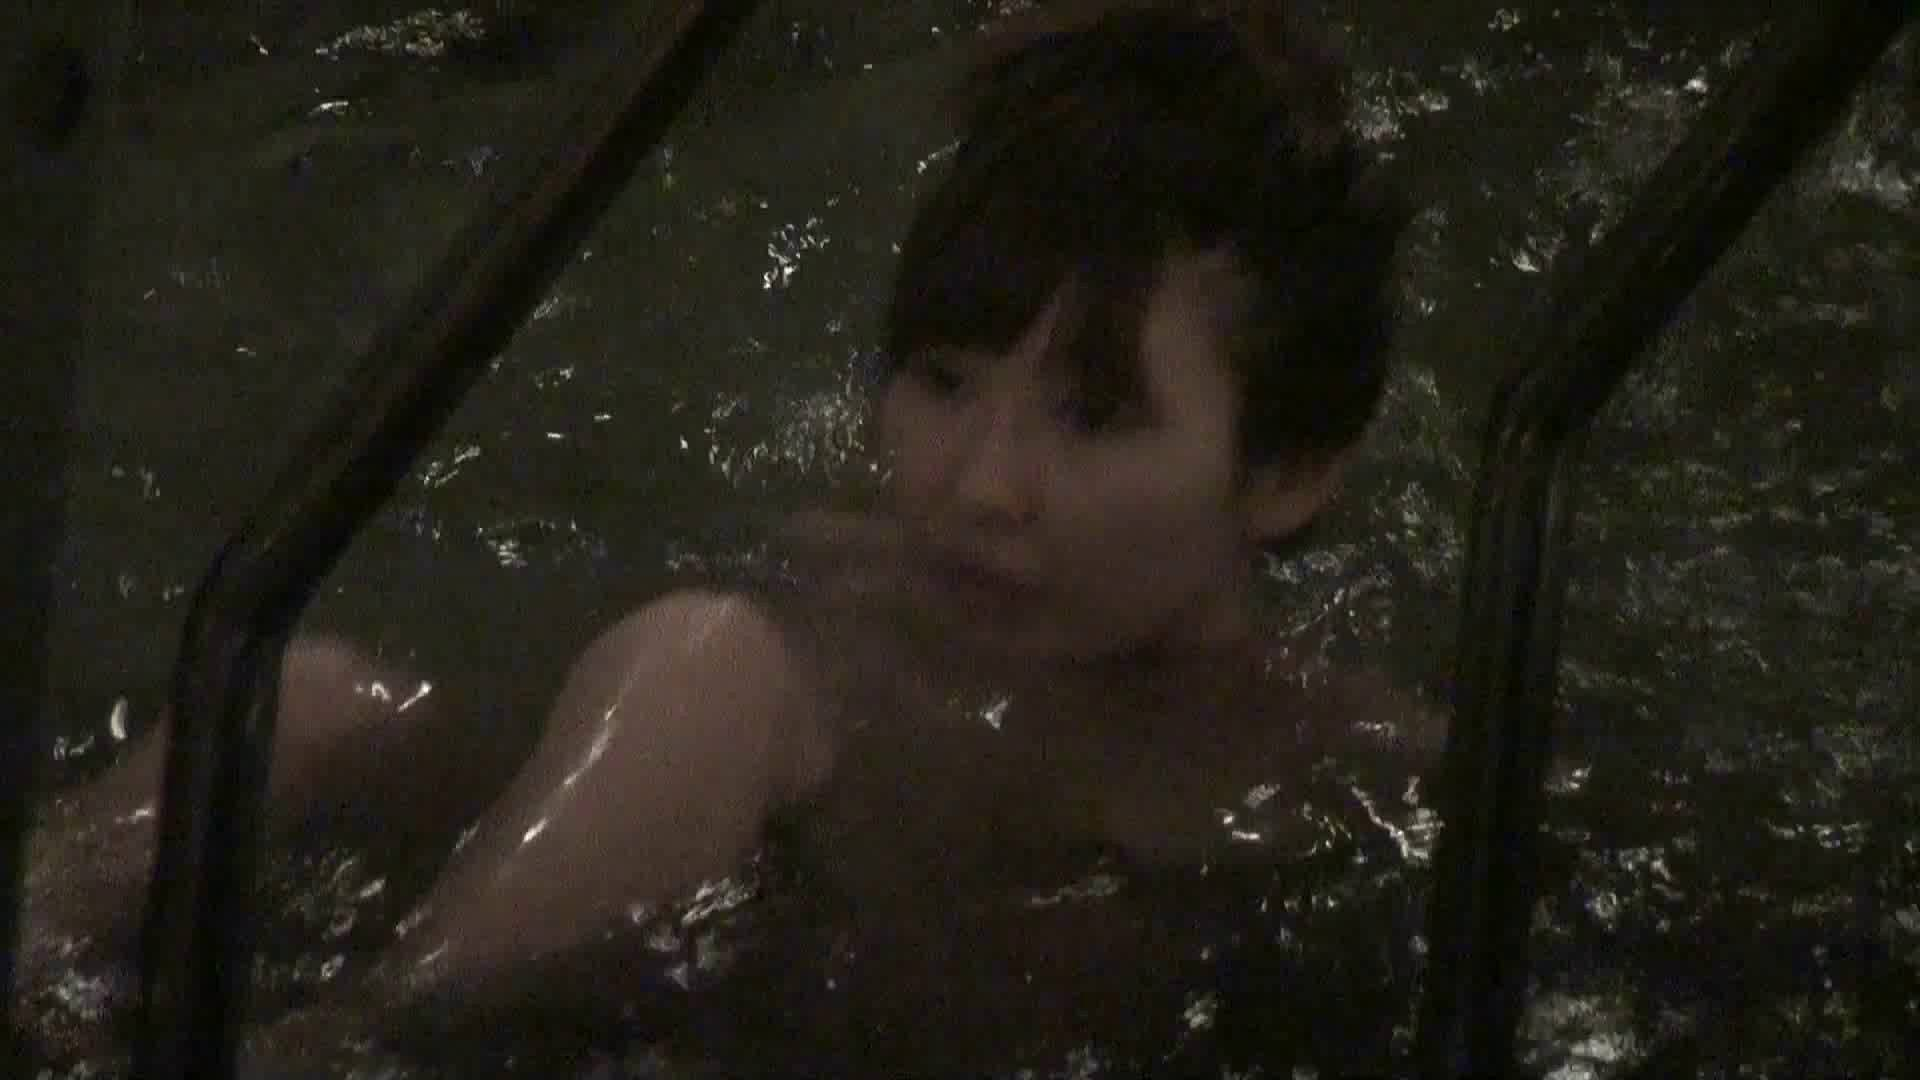 Aquaな露天風呂Vol.410 エッチな盗撮 AV無料動画キャプチャ 76pic 30